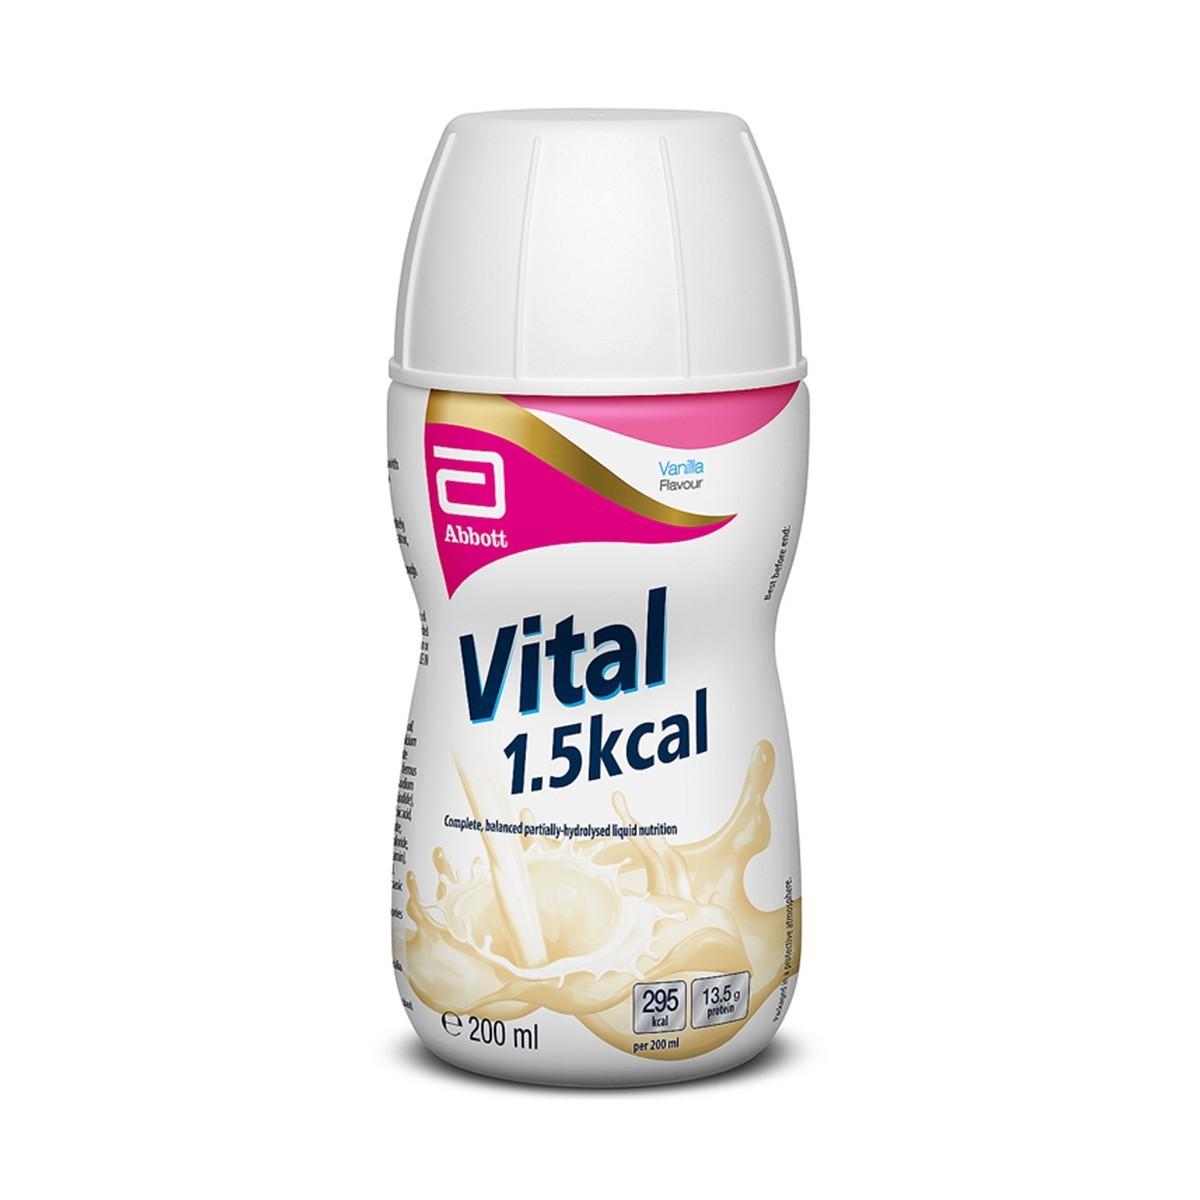 Sữa vital nhập khẩu trự tiếp từ Mỹ